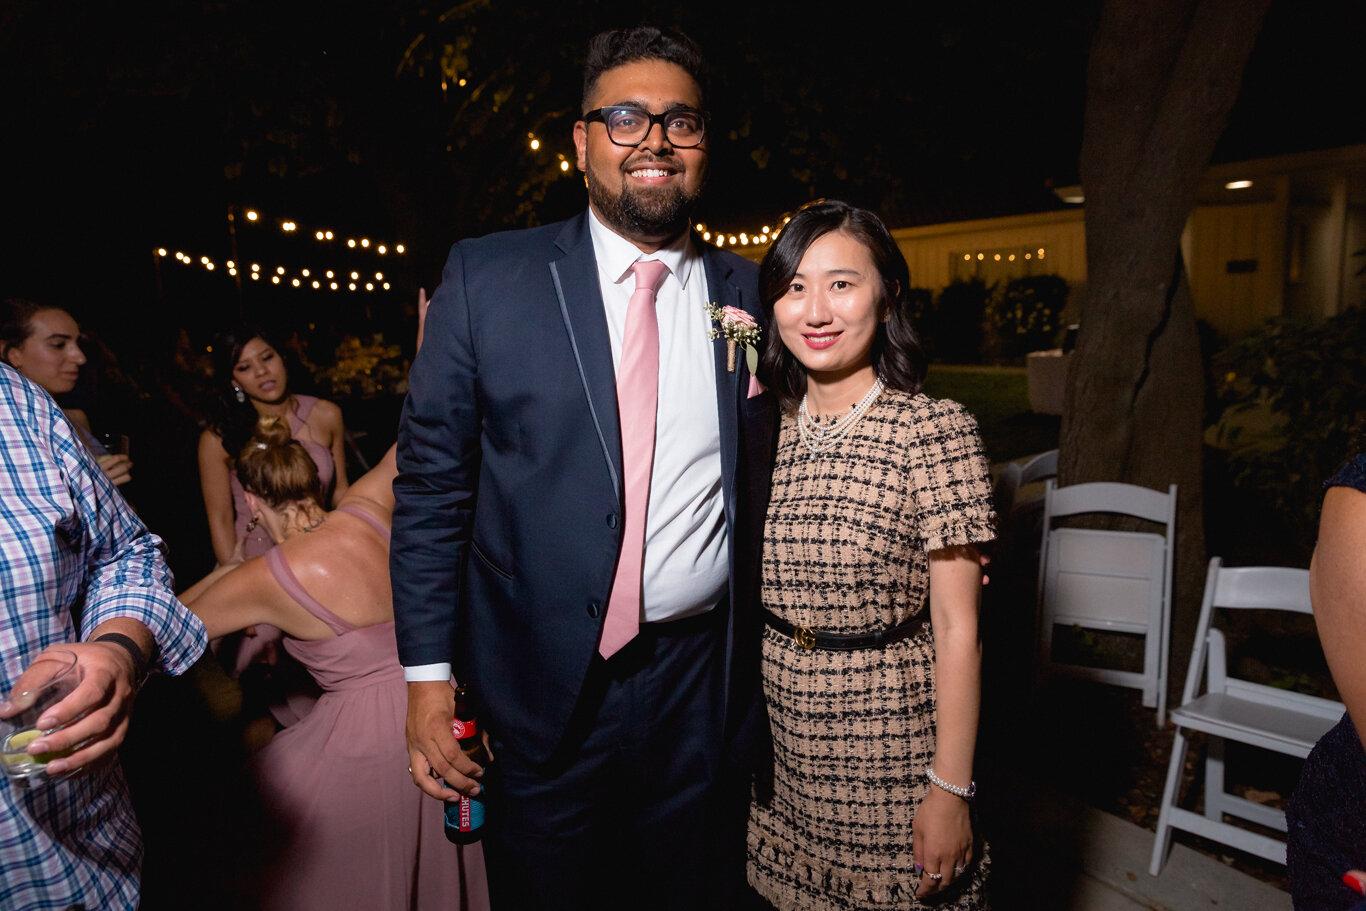 2019.08.24_Emily-Ashir-Wedding-at-the-Maples-6608.jpg